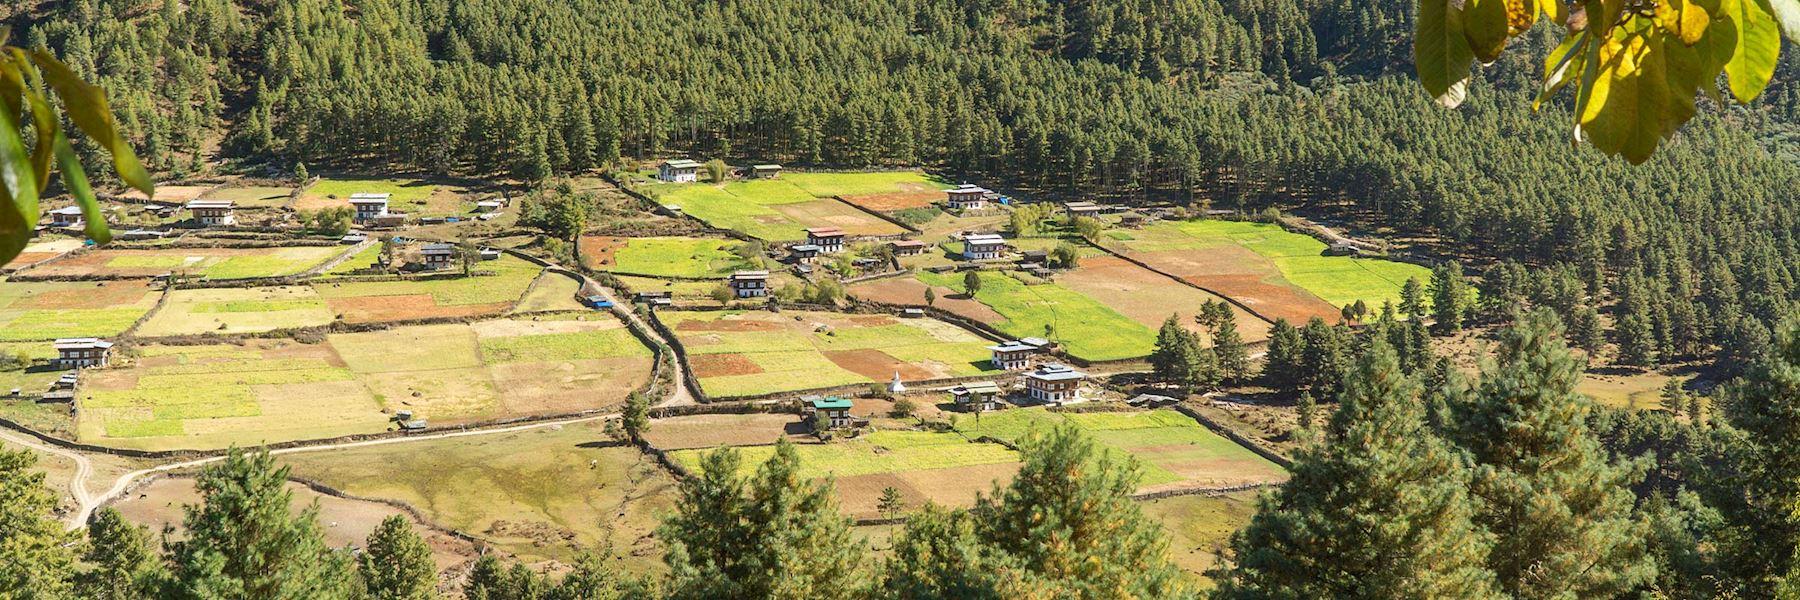 Visit Phobjikha Valley, Bhutan